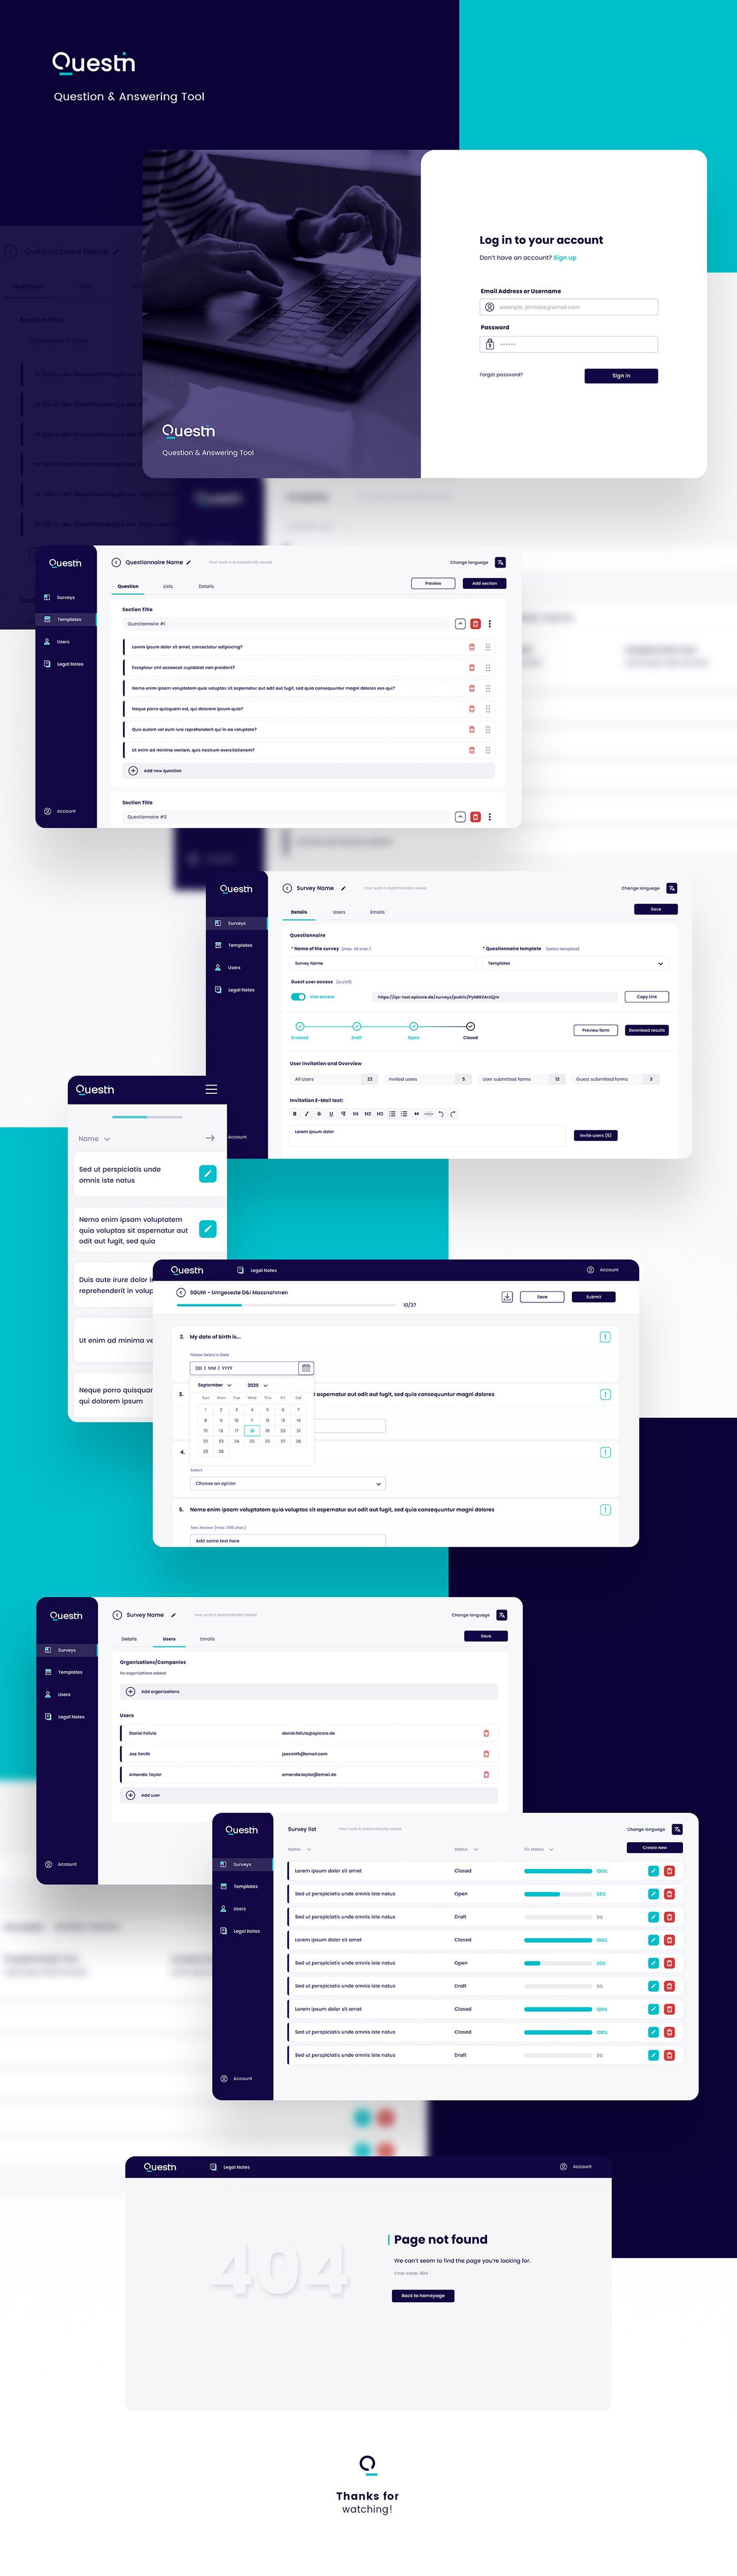 app applicaton clean dashboard minimal question UI uidesign user interface ux